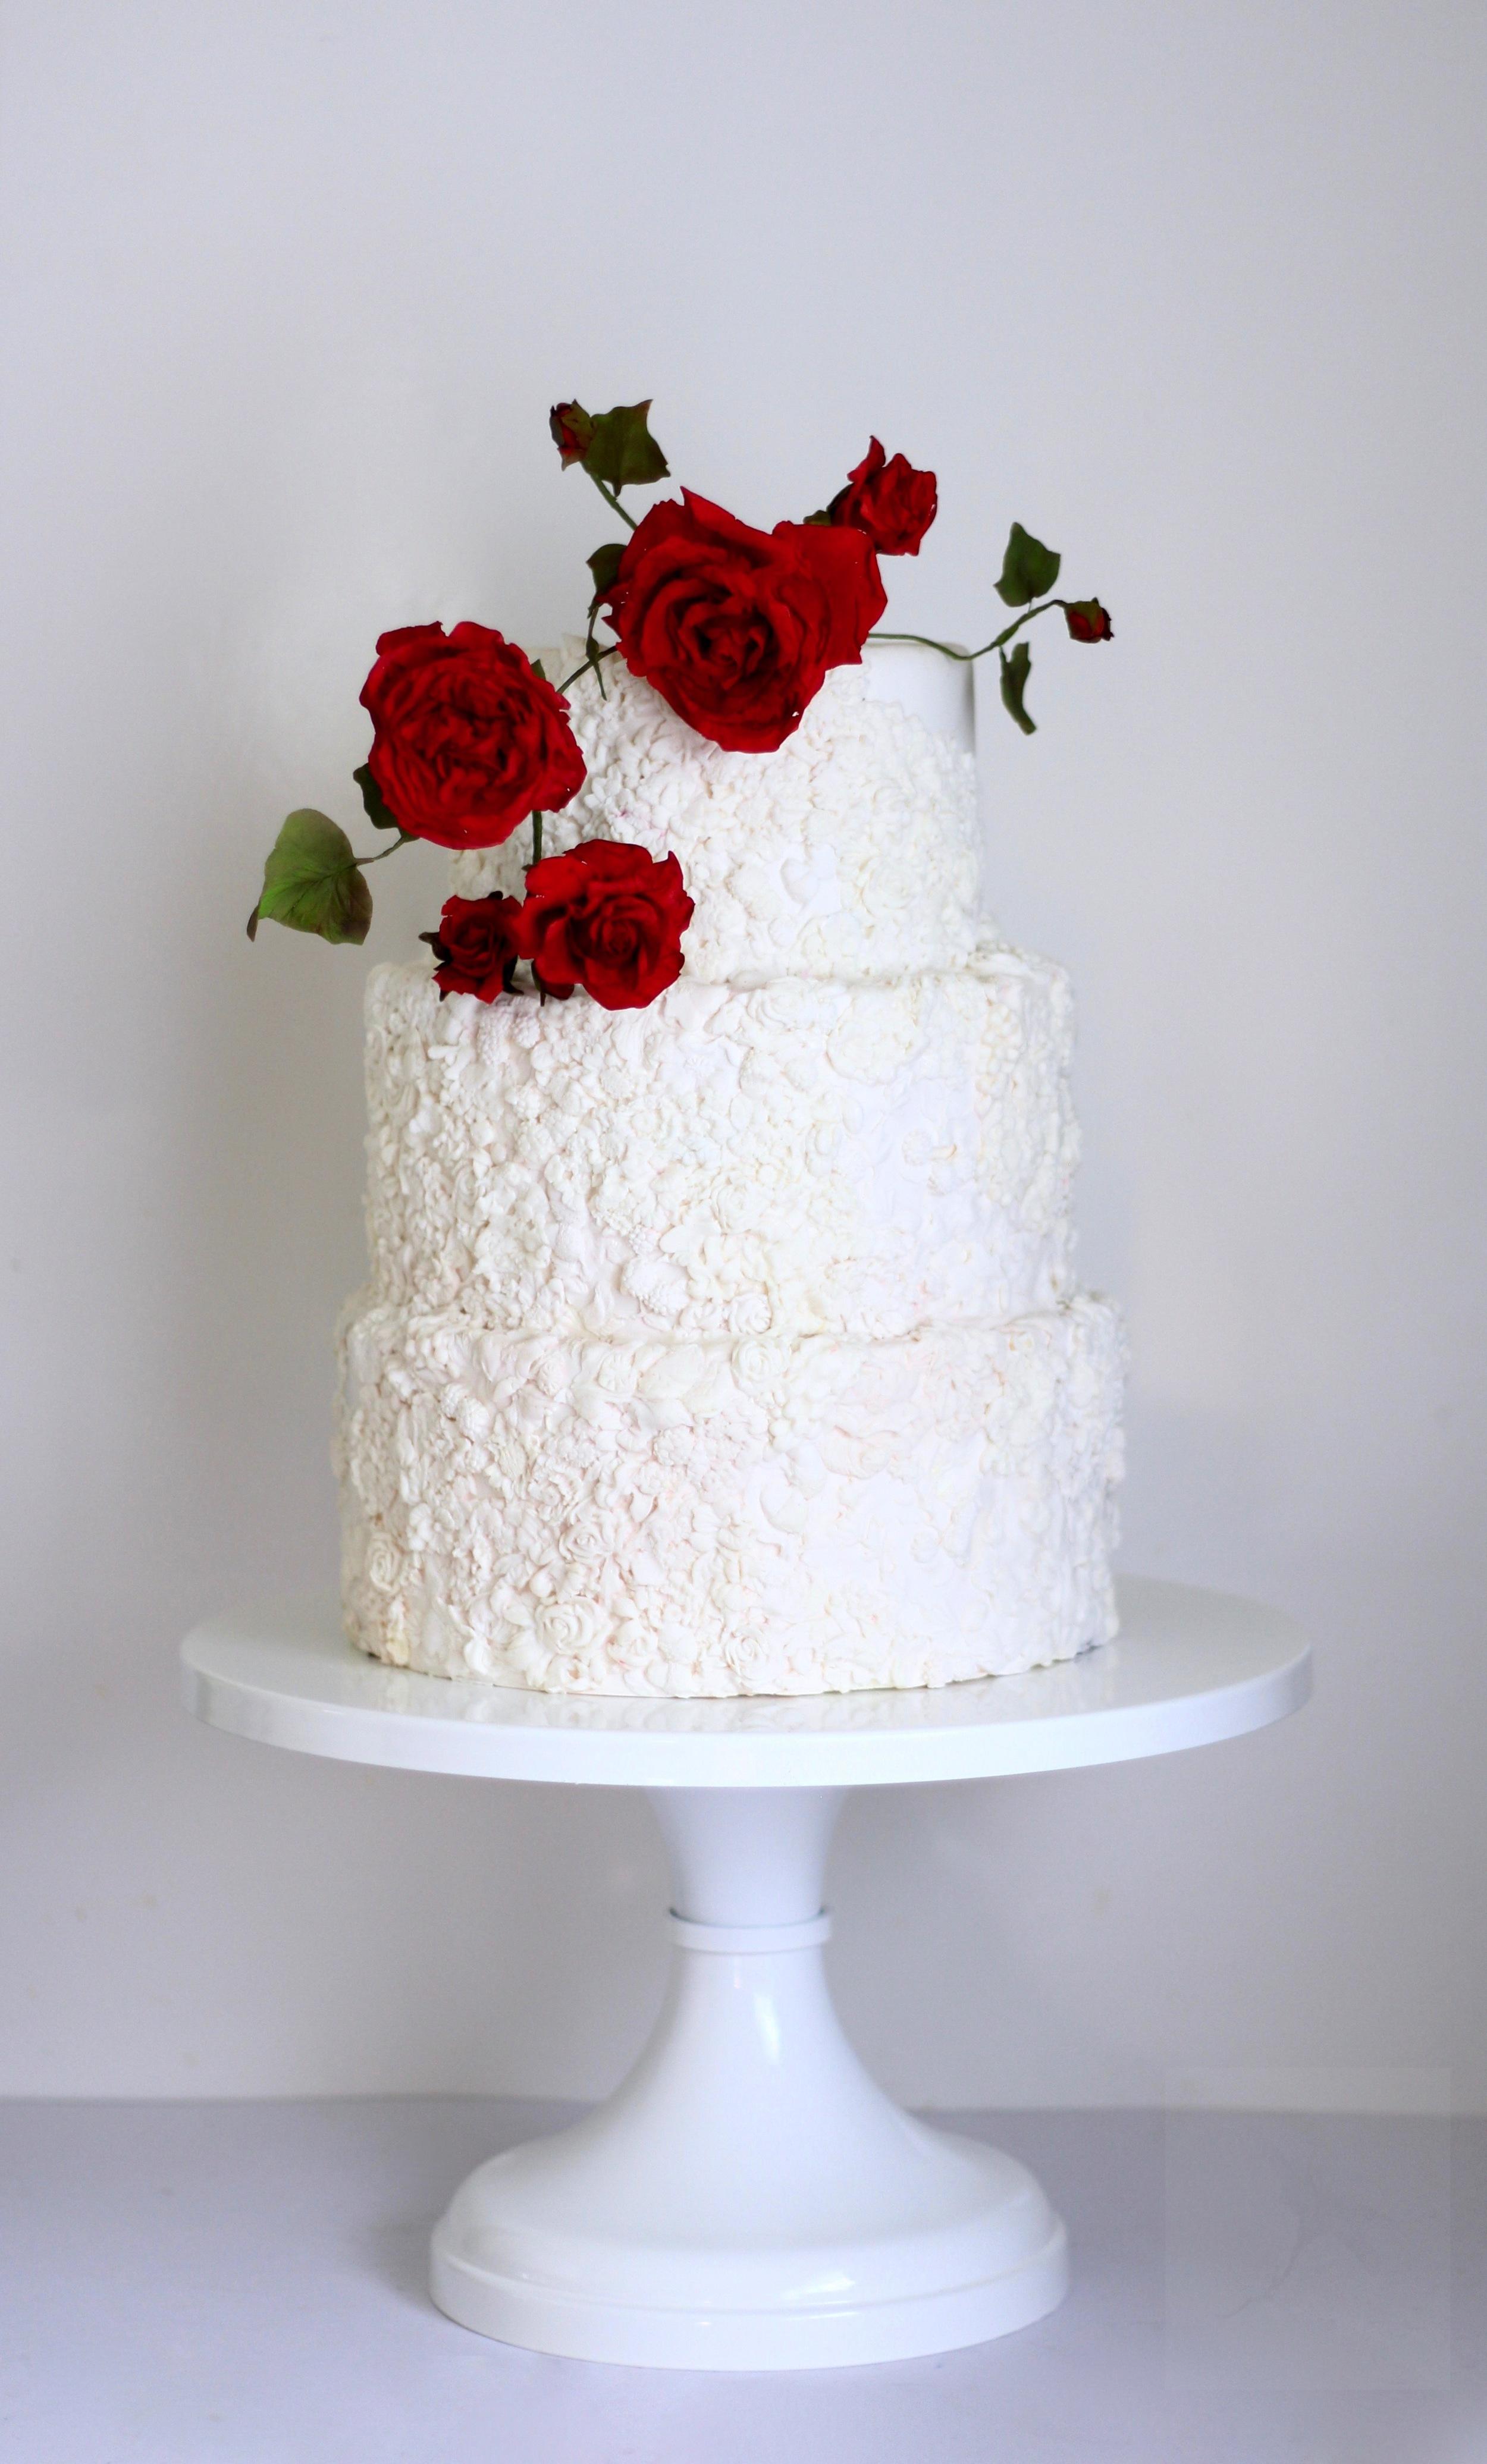 jaime gerard cake red roses and bas relief wedding cake trinidad and tobago.jpg